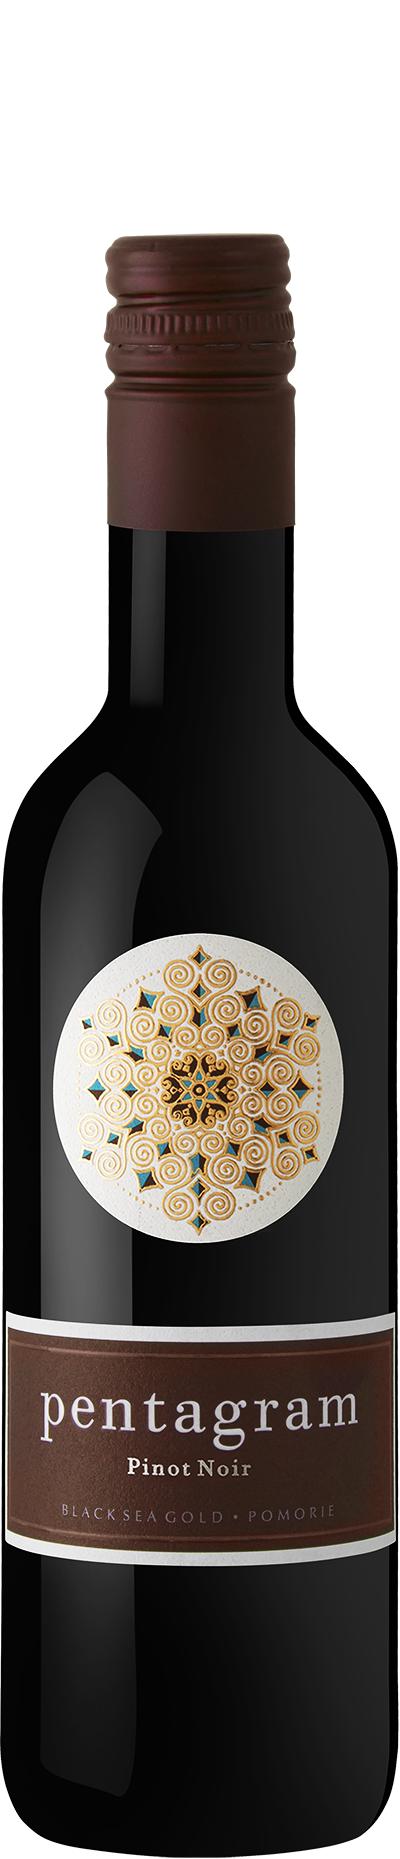 Червено Вино Пентаграм Пино Ноар Поморие 0.375 л